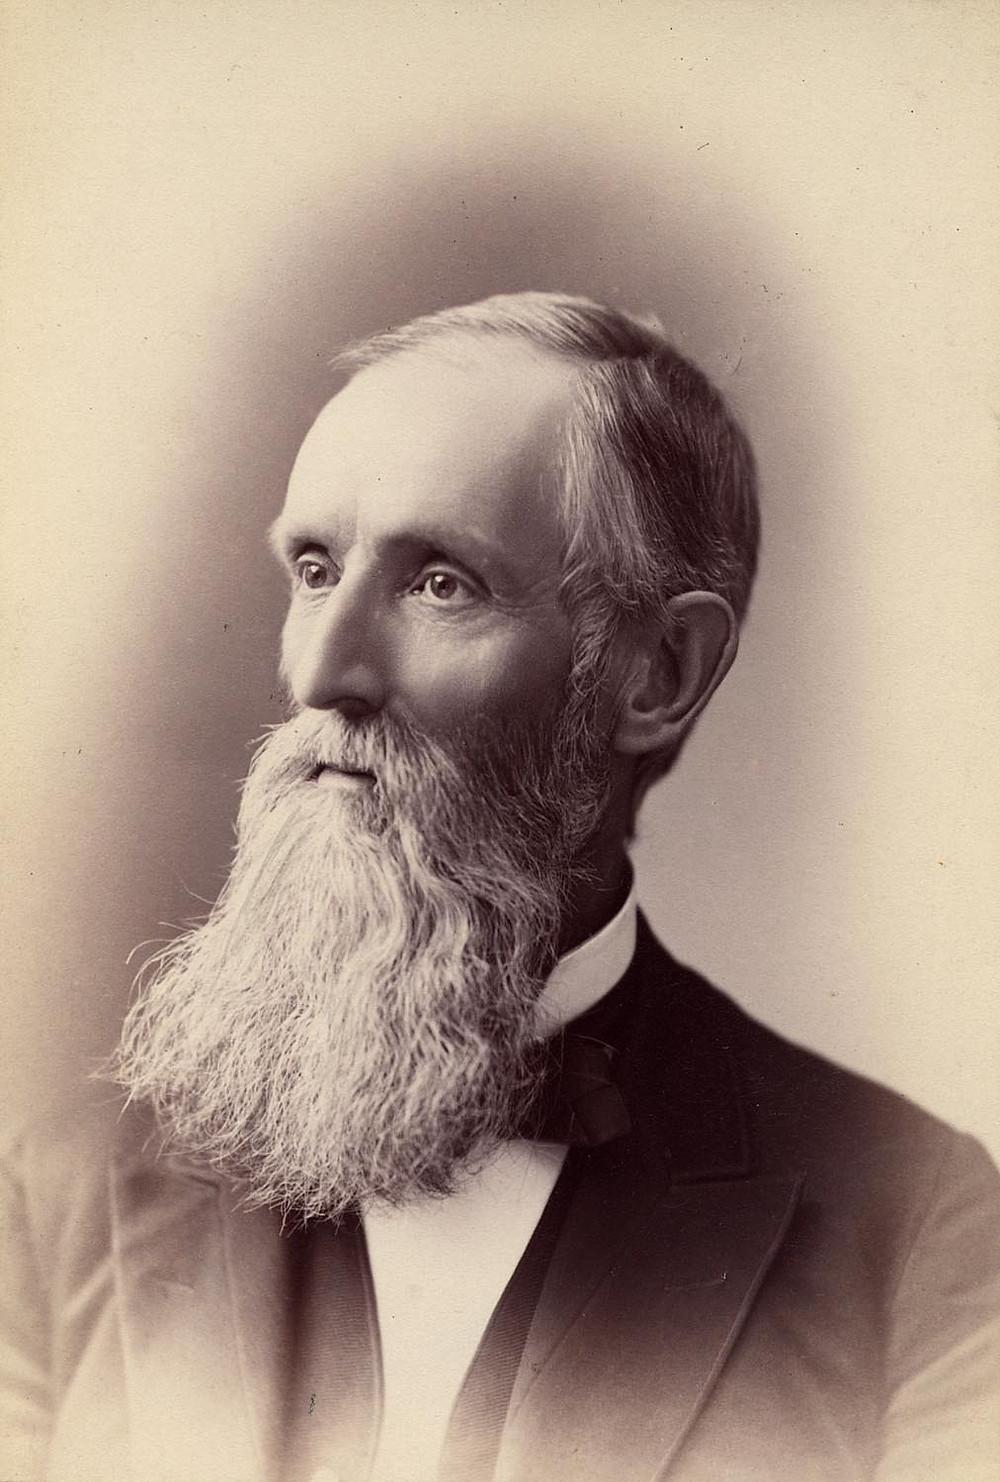 John Bascom - University of Wisconsin Archives https://uwdc.library.wisc.edu